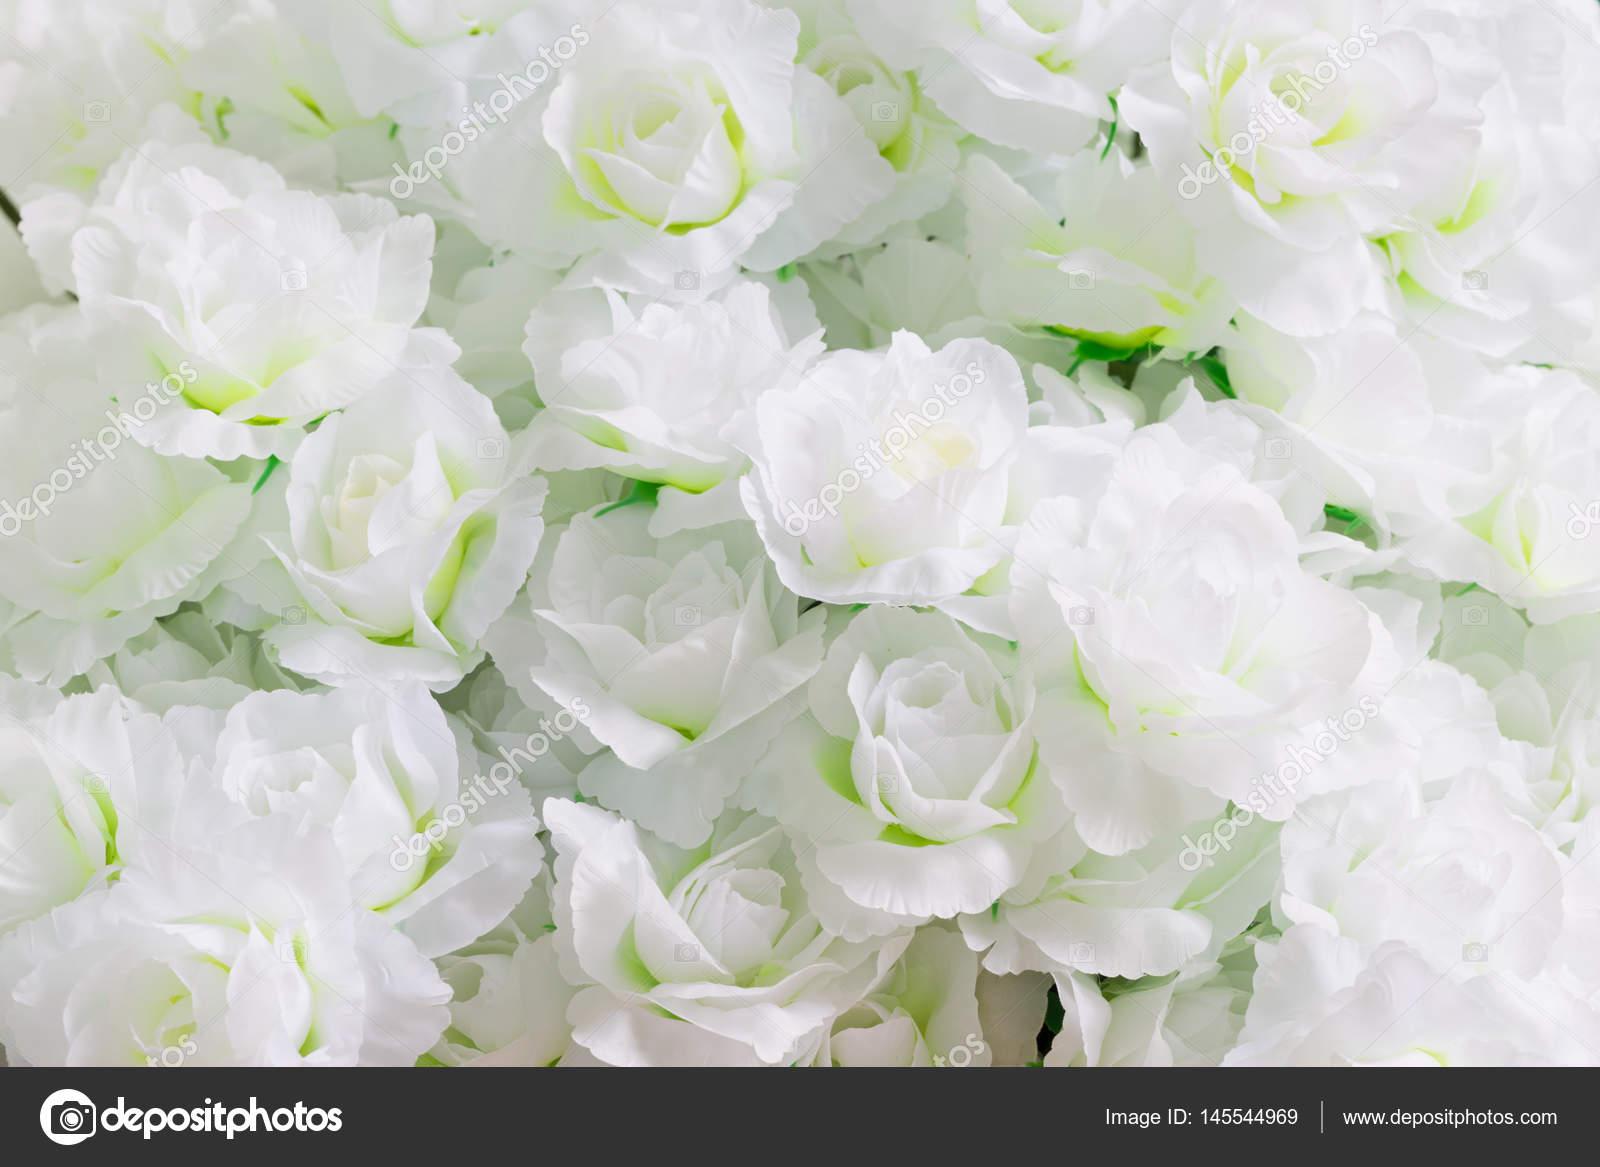 Artificial jasmine white flowers stock photo praiwun 145544969 artificial jasmine white flowers taken as background photo by praiwun izmirmasajfo